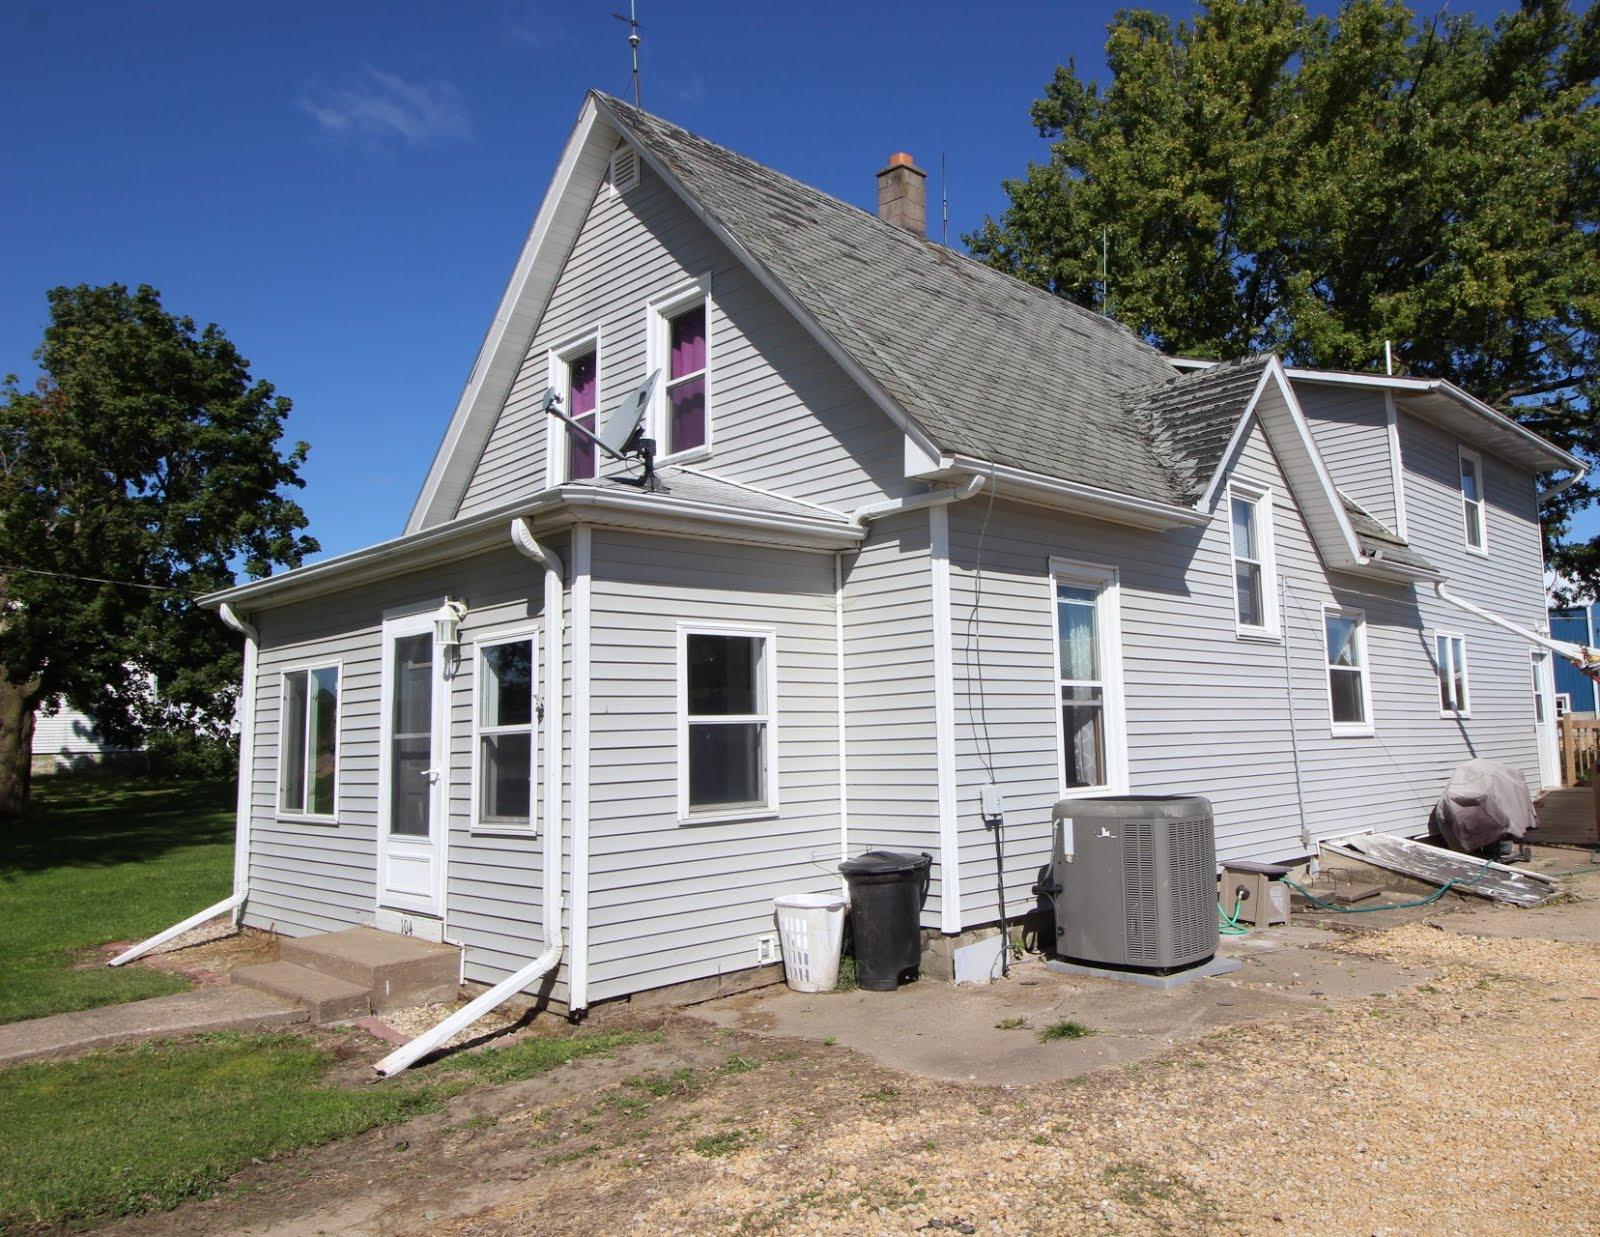 104 West Main St., Spragueville $72,000